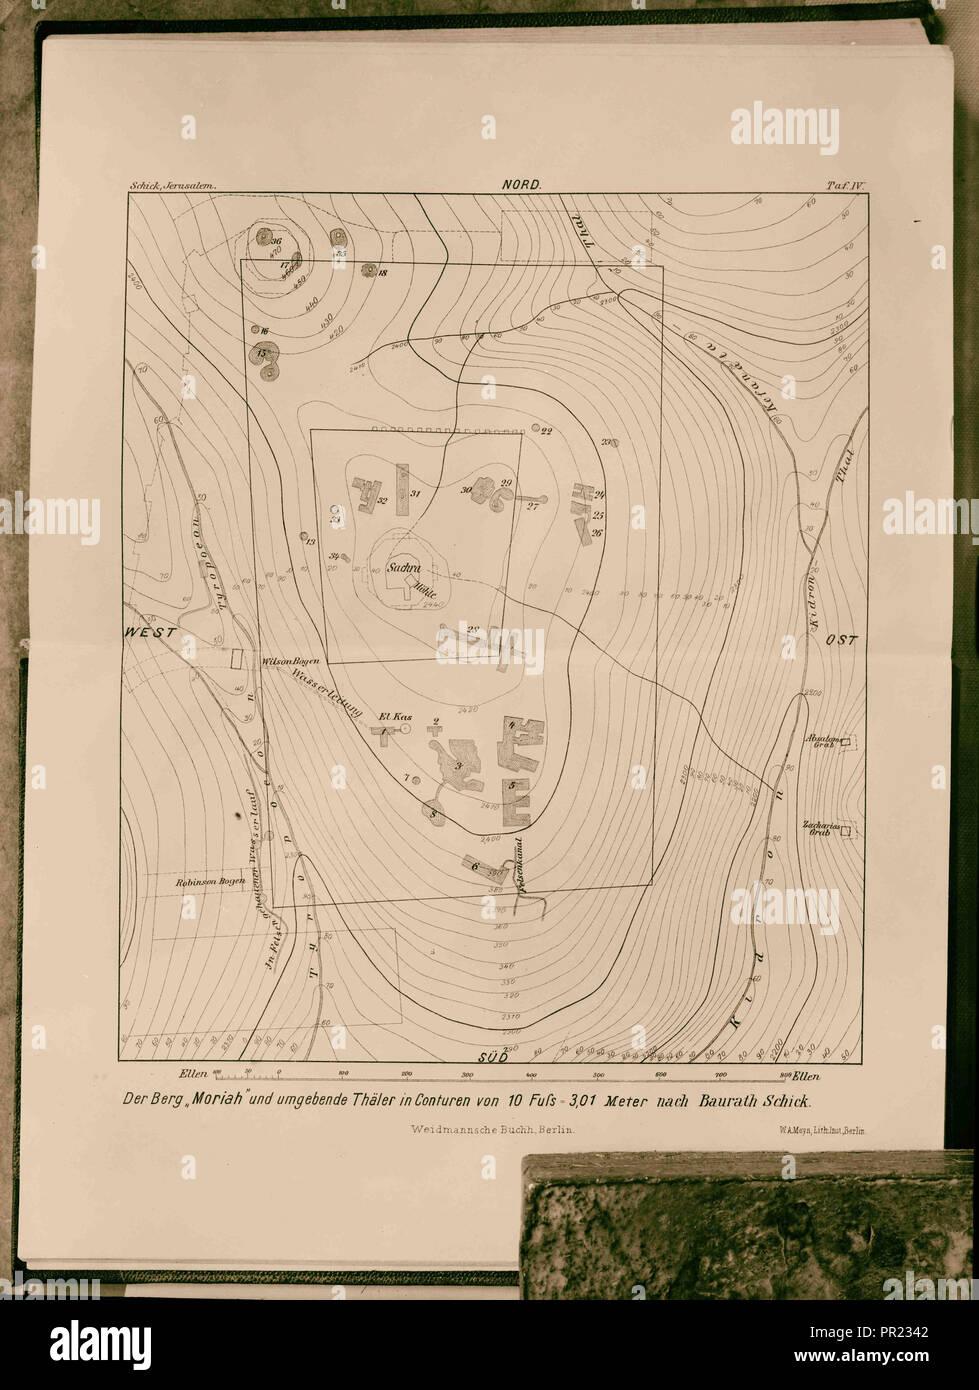 Mt. Moriah Jerusalem Stock Photos & Mt. Moriah Jerusalem ... on carter notch map, carroll map, mount hermon map, mount ebal map, mount carrigain map, land of moriah map, st. john's map, mount calvary map, mount paran map, mount zion, huntington ravine map, the mount of olives map, monadnock state park trail map, mount shechem map, golgotha map, moriah trail map, mount chocorua map, obion county map, mount marathon map, temple mount map,